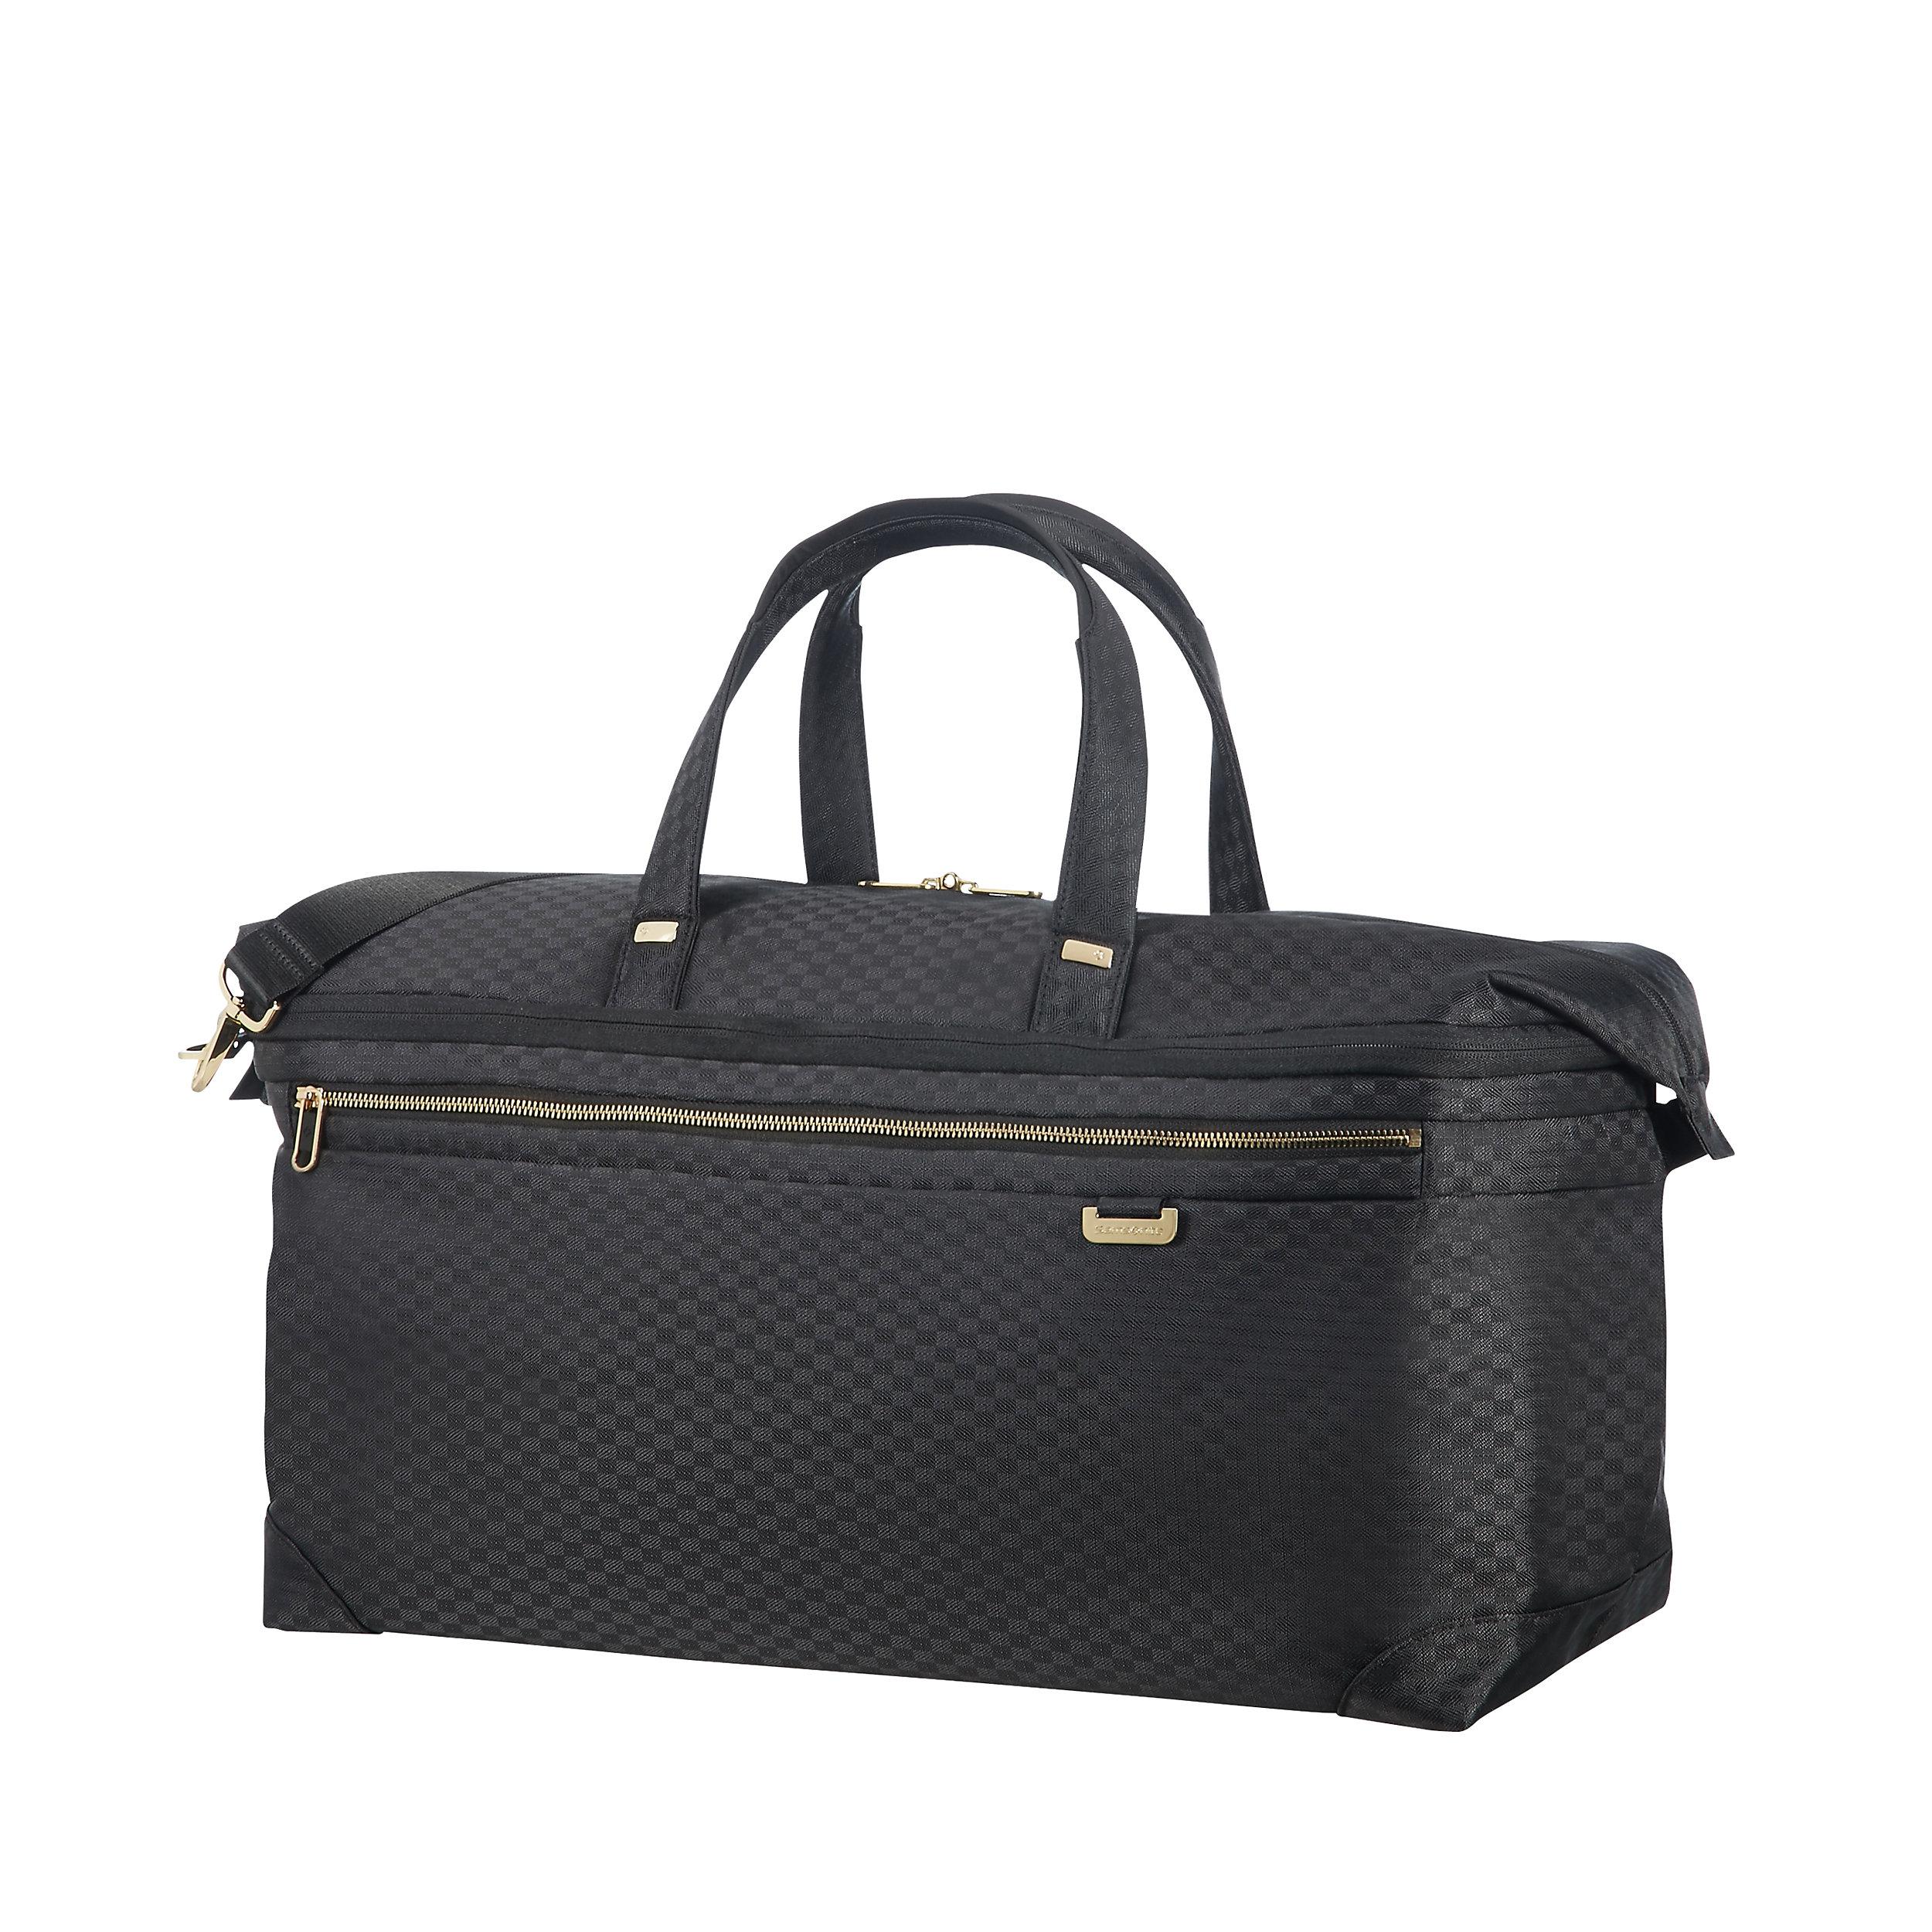 Travel Bag 45/18 EXP Uplite 30 Liter